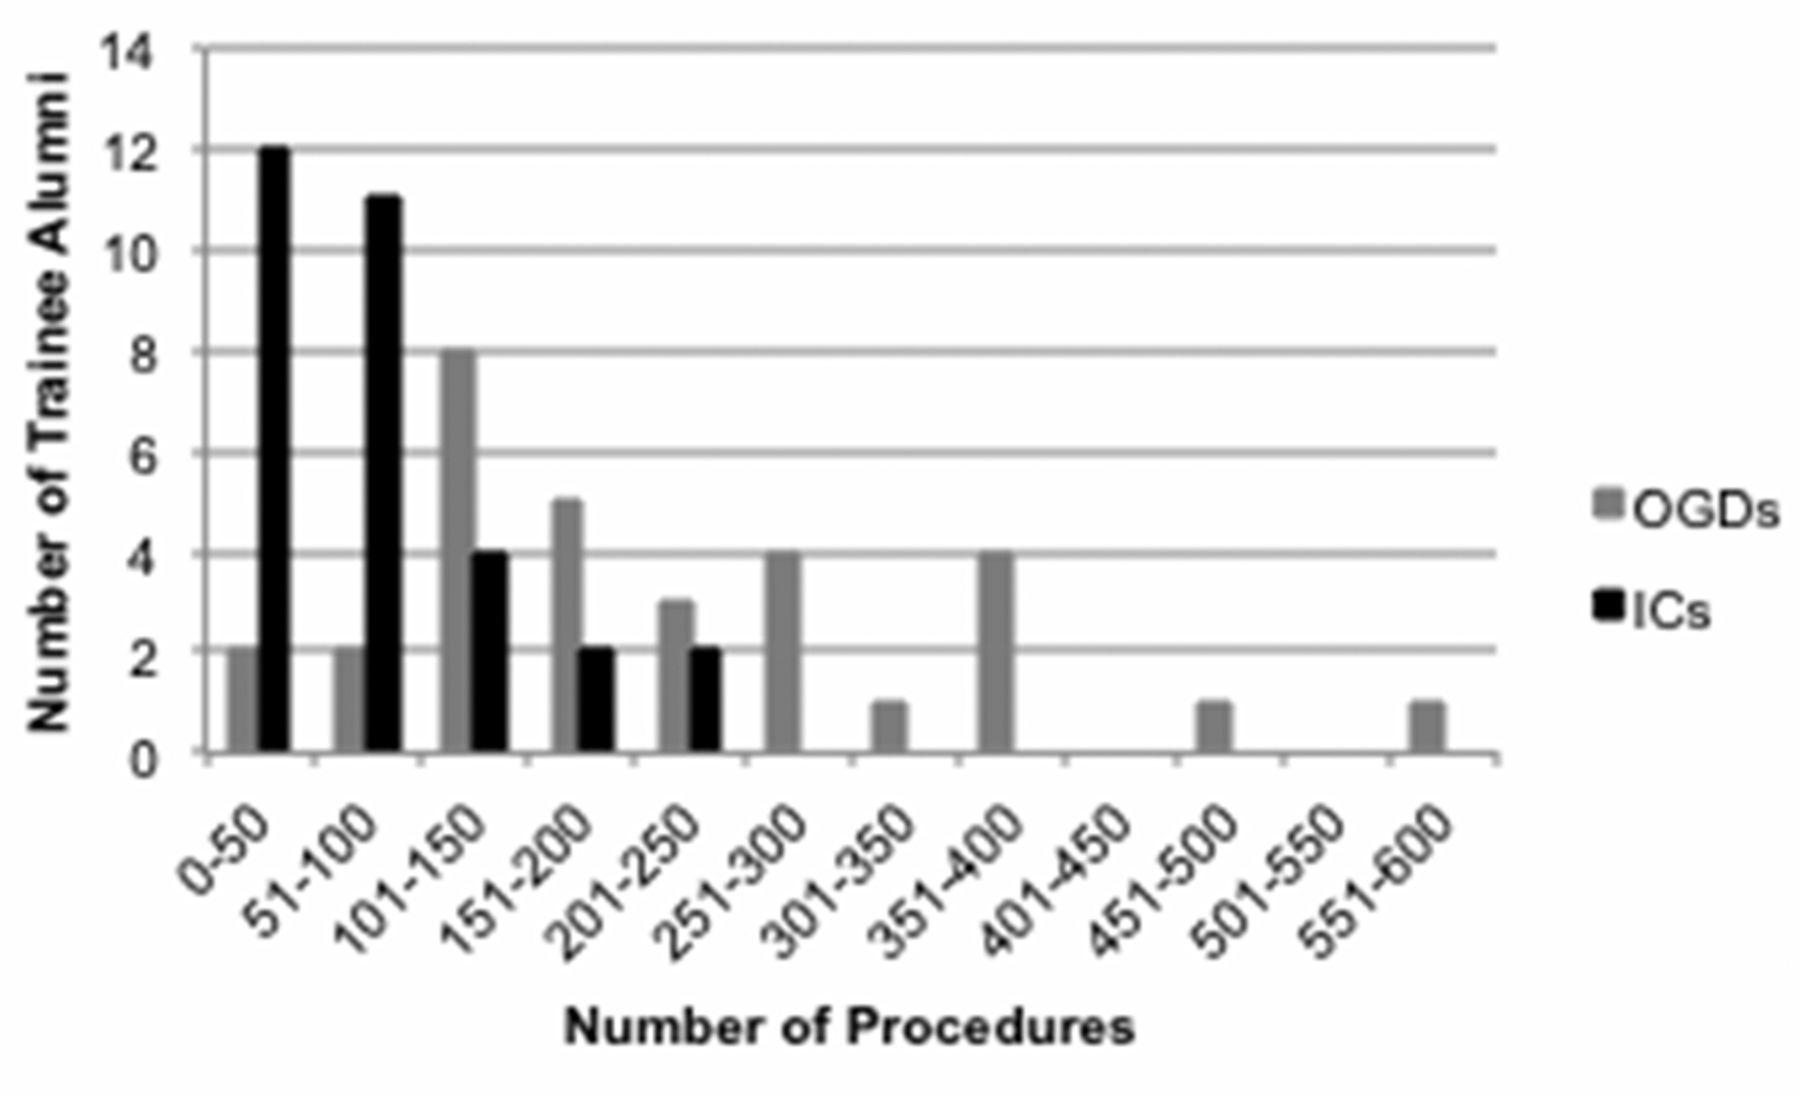 Evaluation of a European-wide survey on paediatric endoscopy